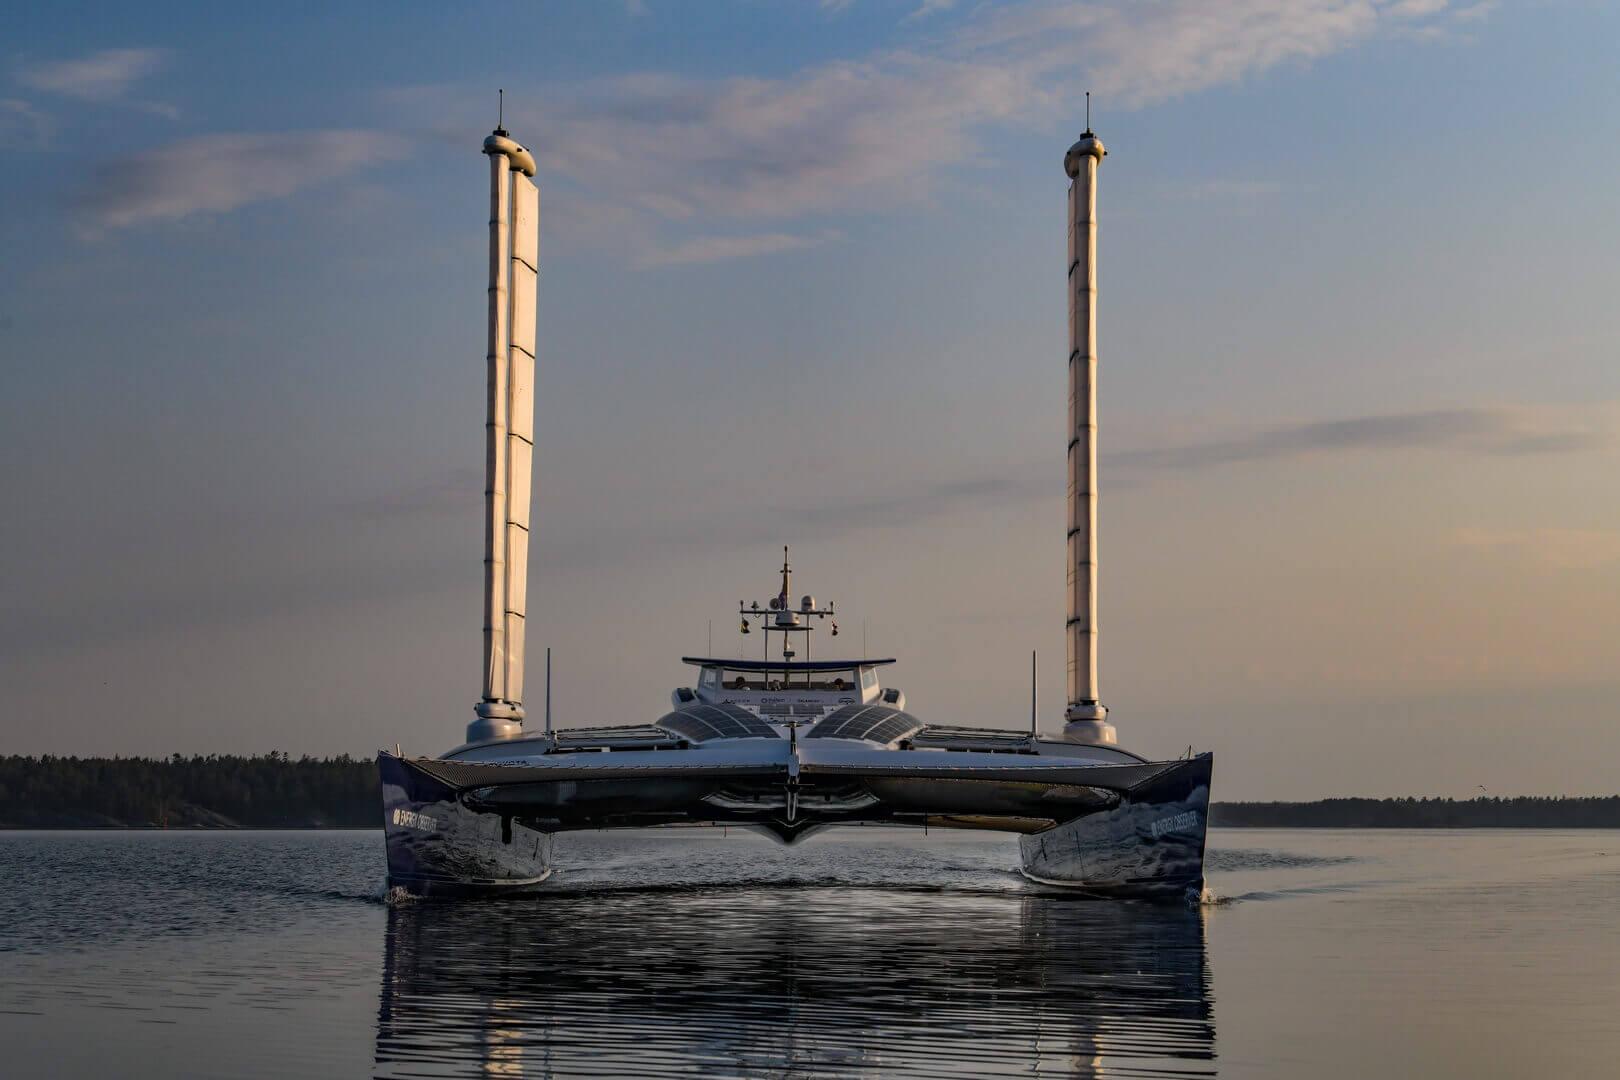 Energy Observer выйдет в море на водородном приводе от Toyota Mirai